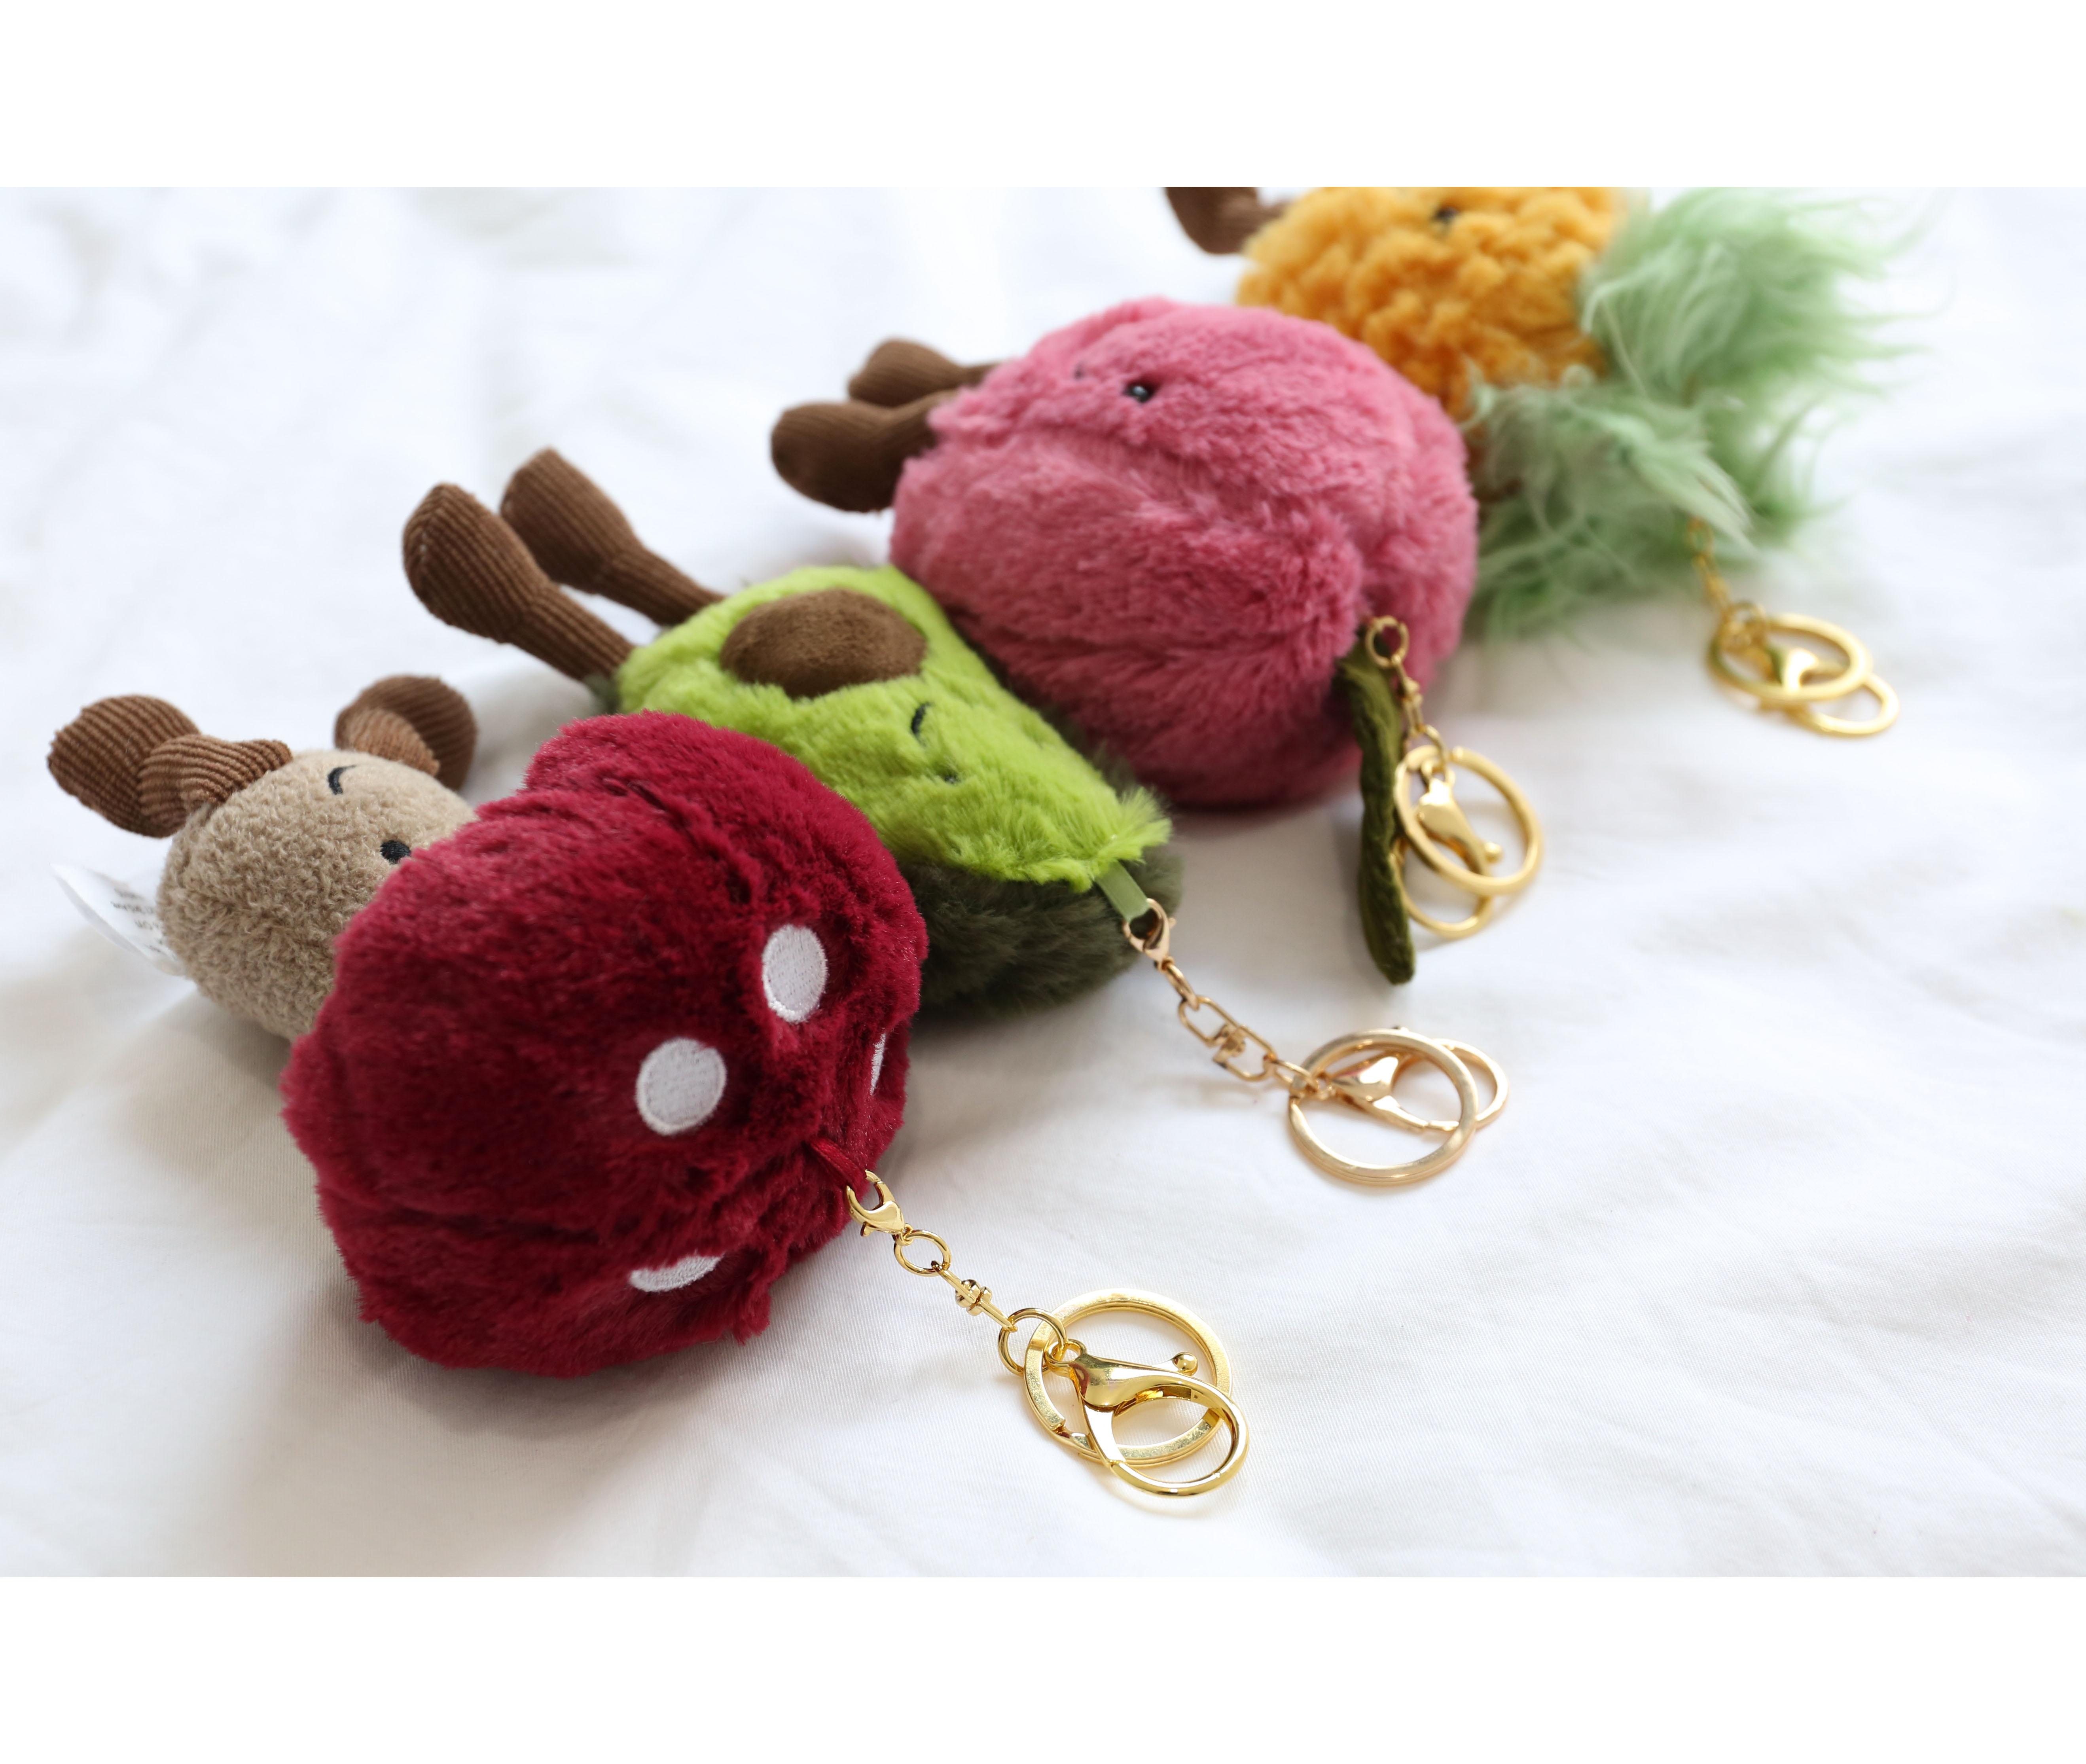 FZ丨日系復古可愛水果毛絨玩具公仔包包掛件少女心生日禮物ins潮